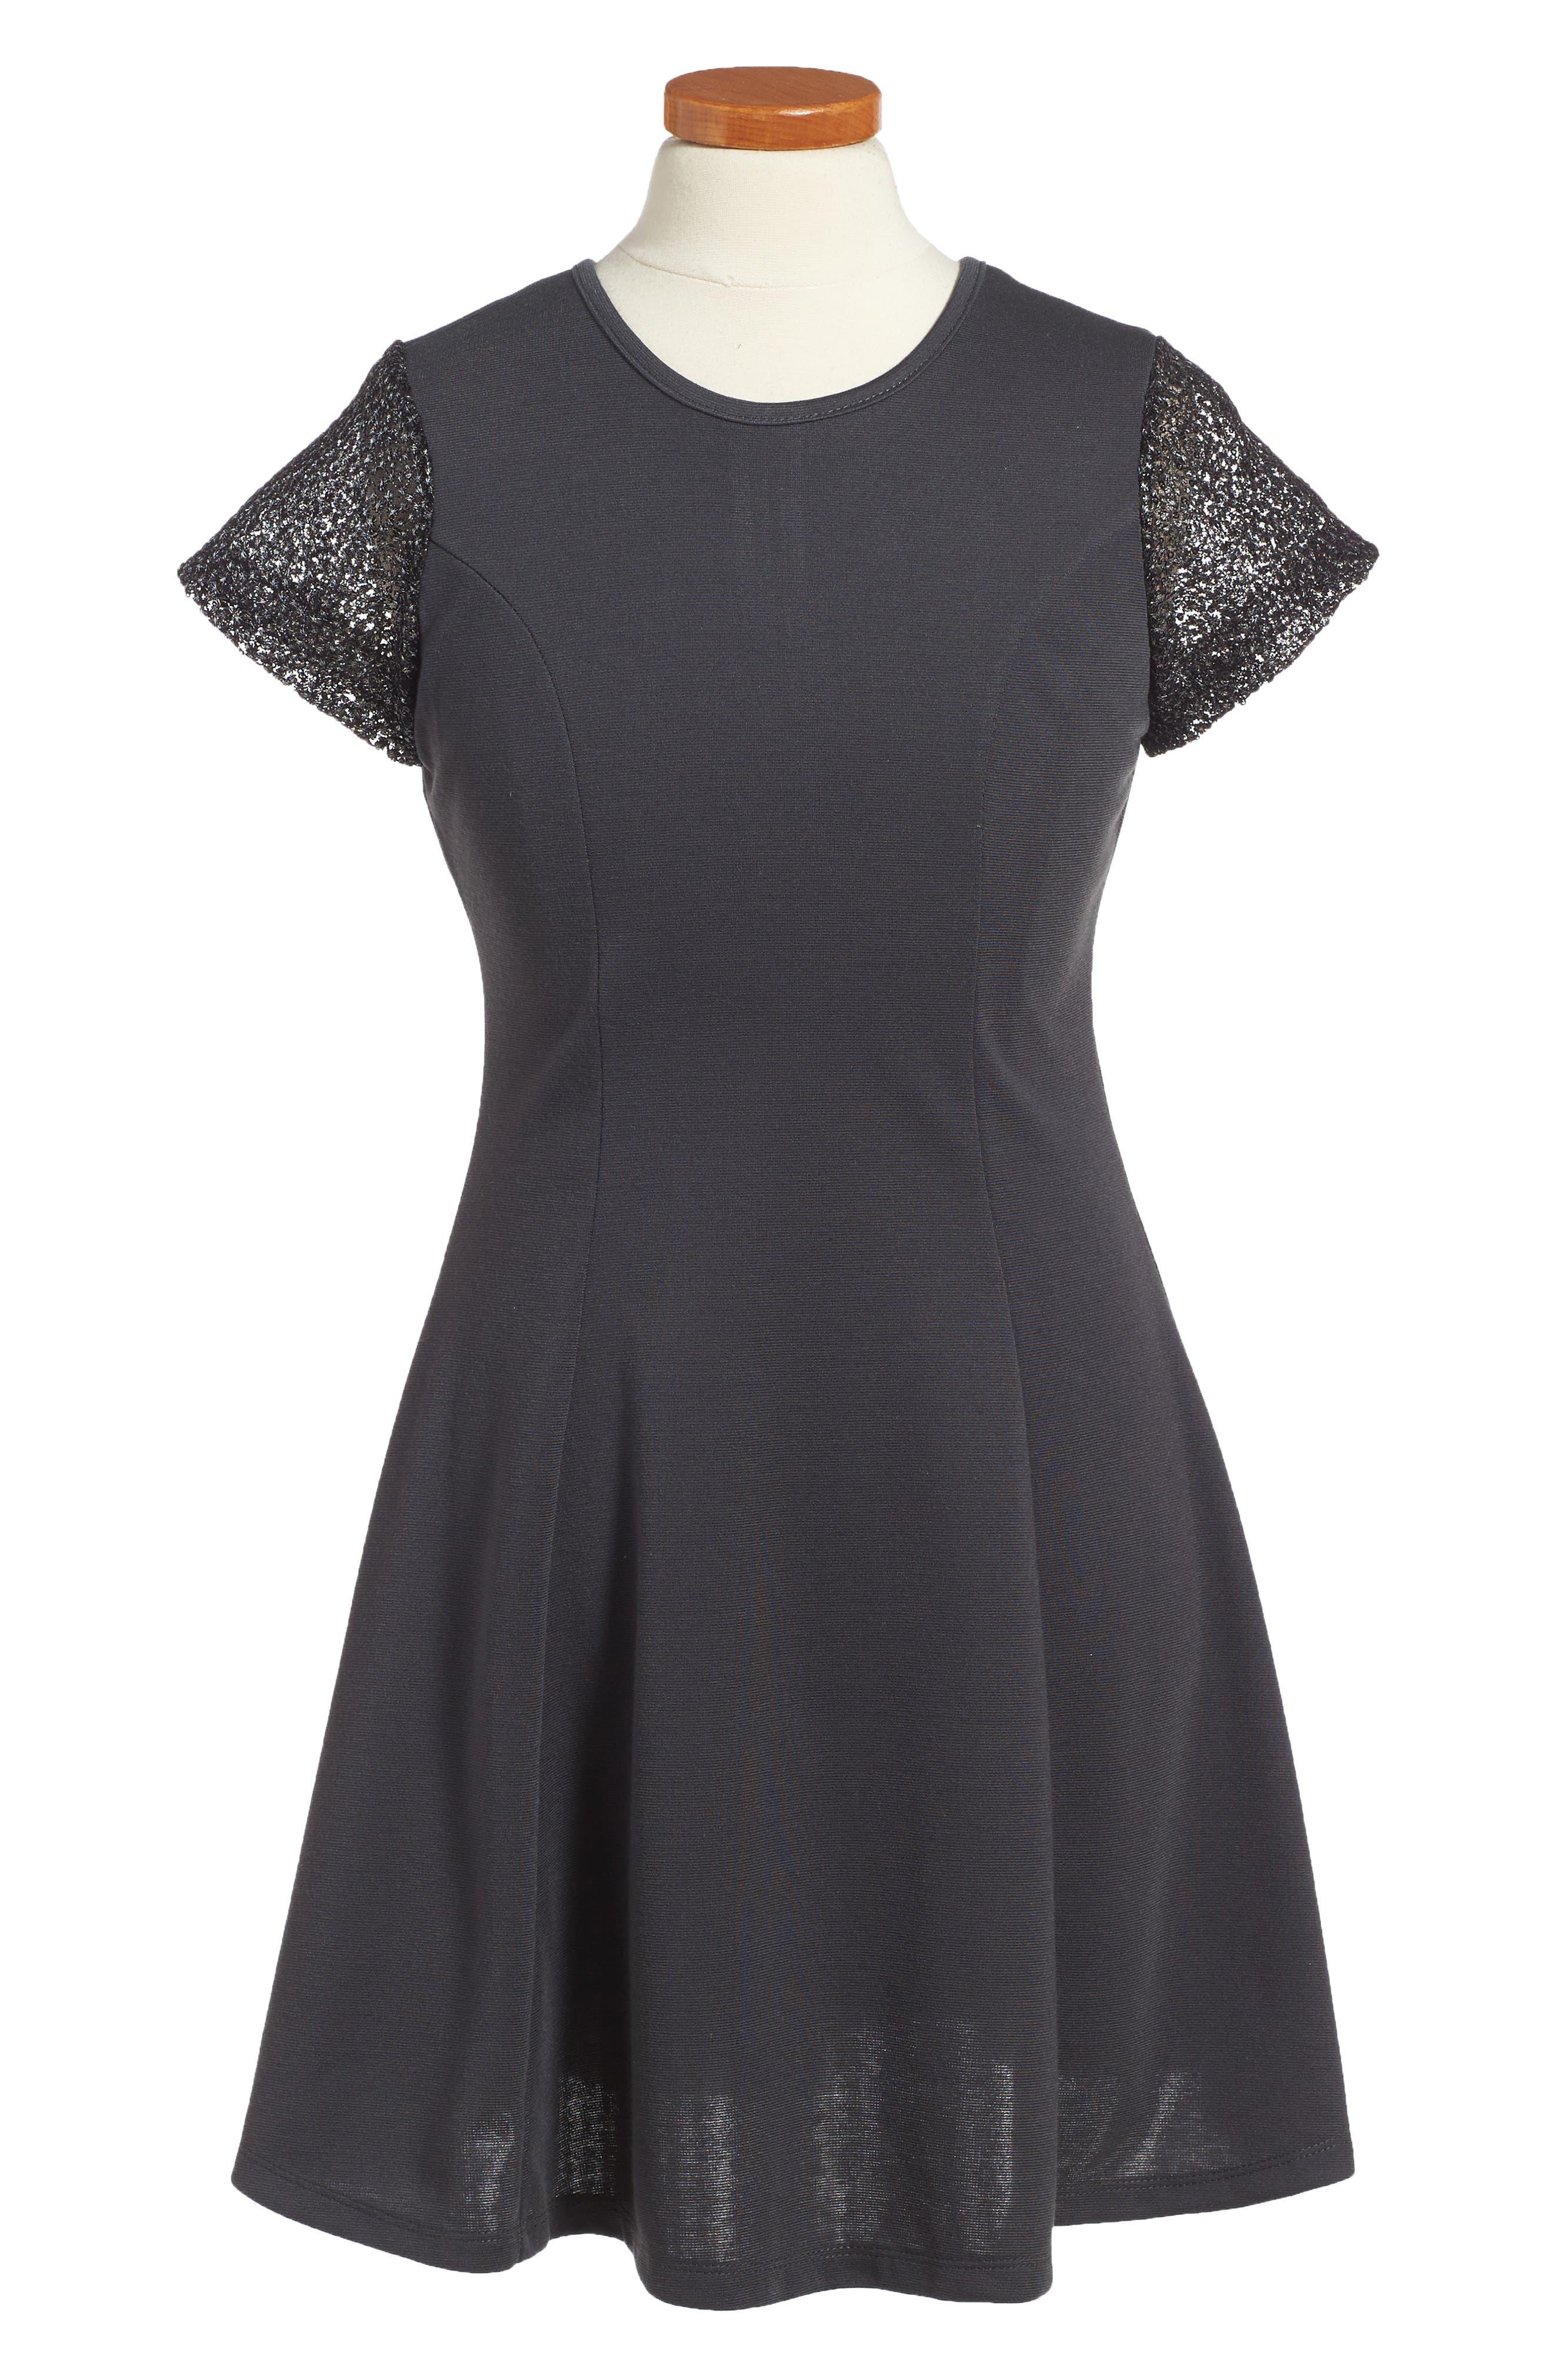 Priscilla Mesh Sleeve Dress,                             Main thumbnail 1, color,                             Charcoal